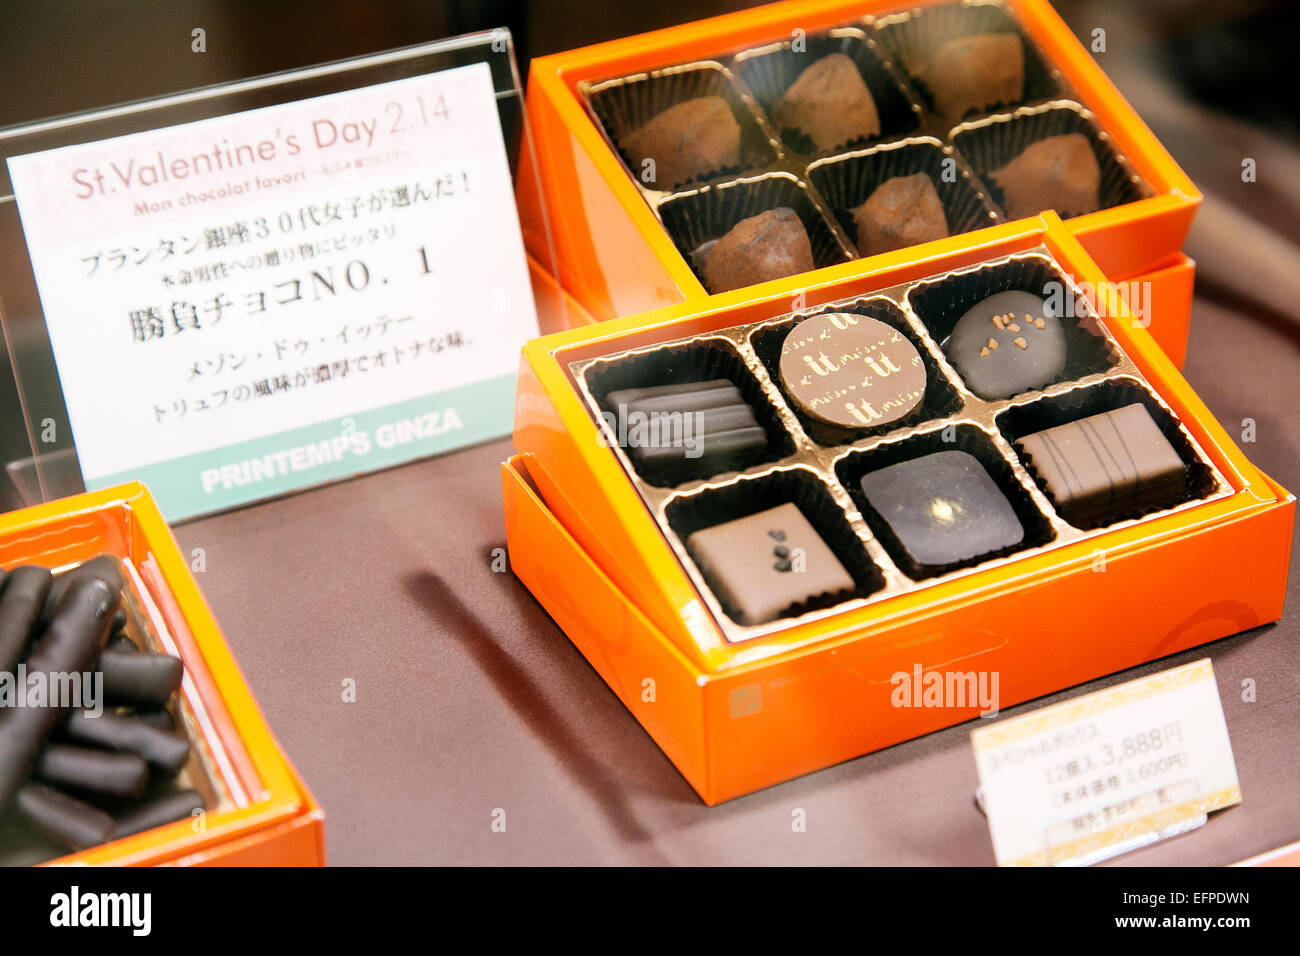 "Valentine's Chocolate on display on February 9, 2015, Tokyo, Japan : Maison d'IT is the most popular ""Shobu-choco"" Stock Photo"